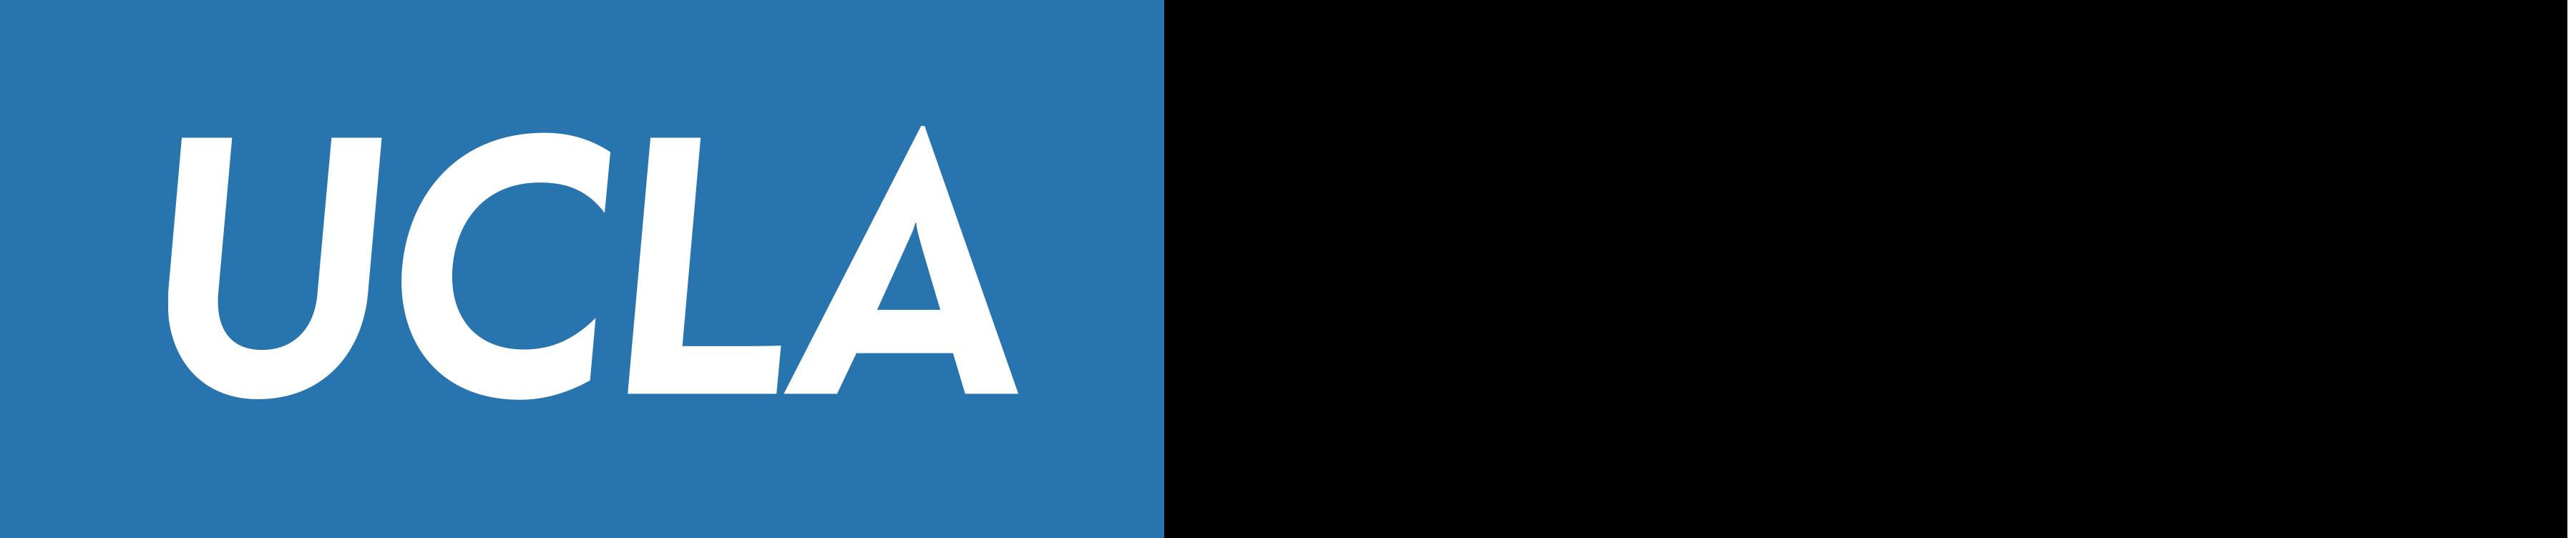 UCLA_H_2019_RGB